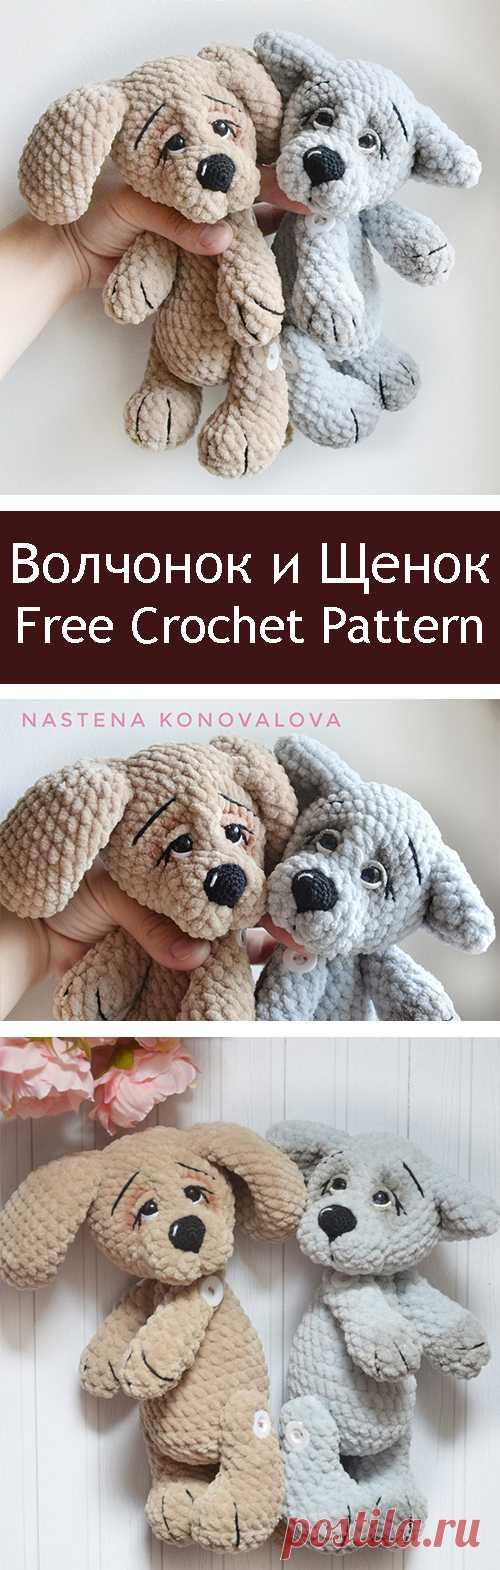 PDF Волчонок и щенок. FREE amigurumi crochet pattern. Бесплатный мастер-класс, схема и описание для вязания игрушки амигуруми крючком. Вяжем игрушки своими руками! Собака, собачка, пес, dog, puppy, волк, wolf. #амигуруми #amigurumi #amigurumidoll #amigurumipattern #freepattern #freecrochetpatterns #crochetpattern #crochetdoll #crochettutorial #patternsforcrochet #вязание #вязаниекрючком #handmadedoll #рукоделие #ручнаяработа #pattern #tutorial #häkeln #amigurumis